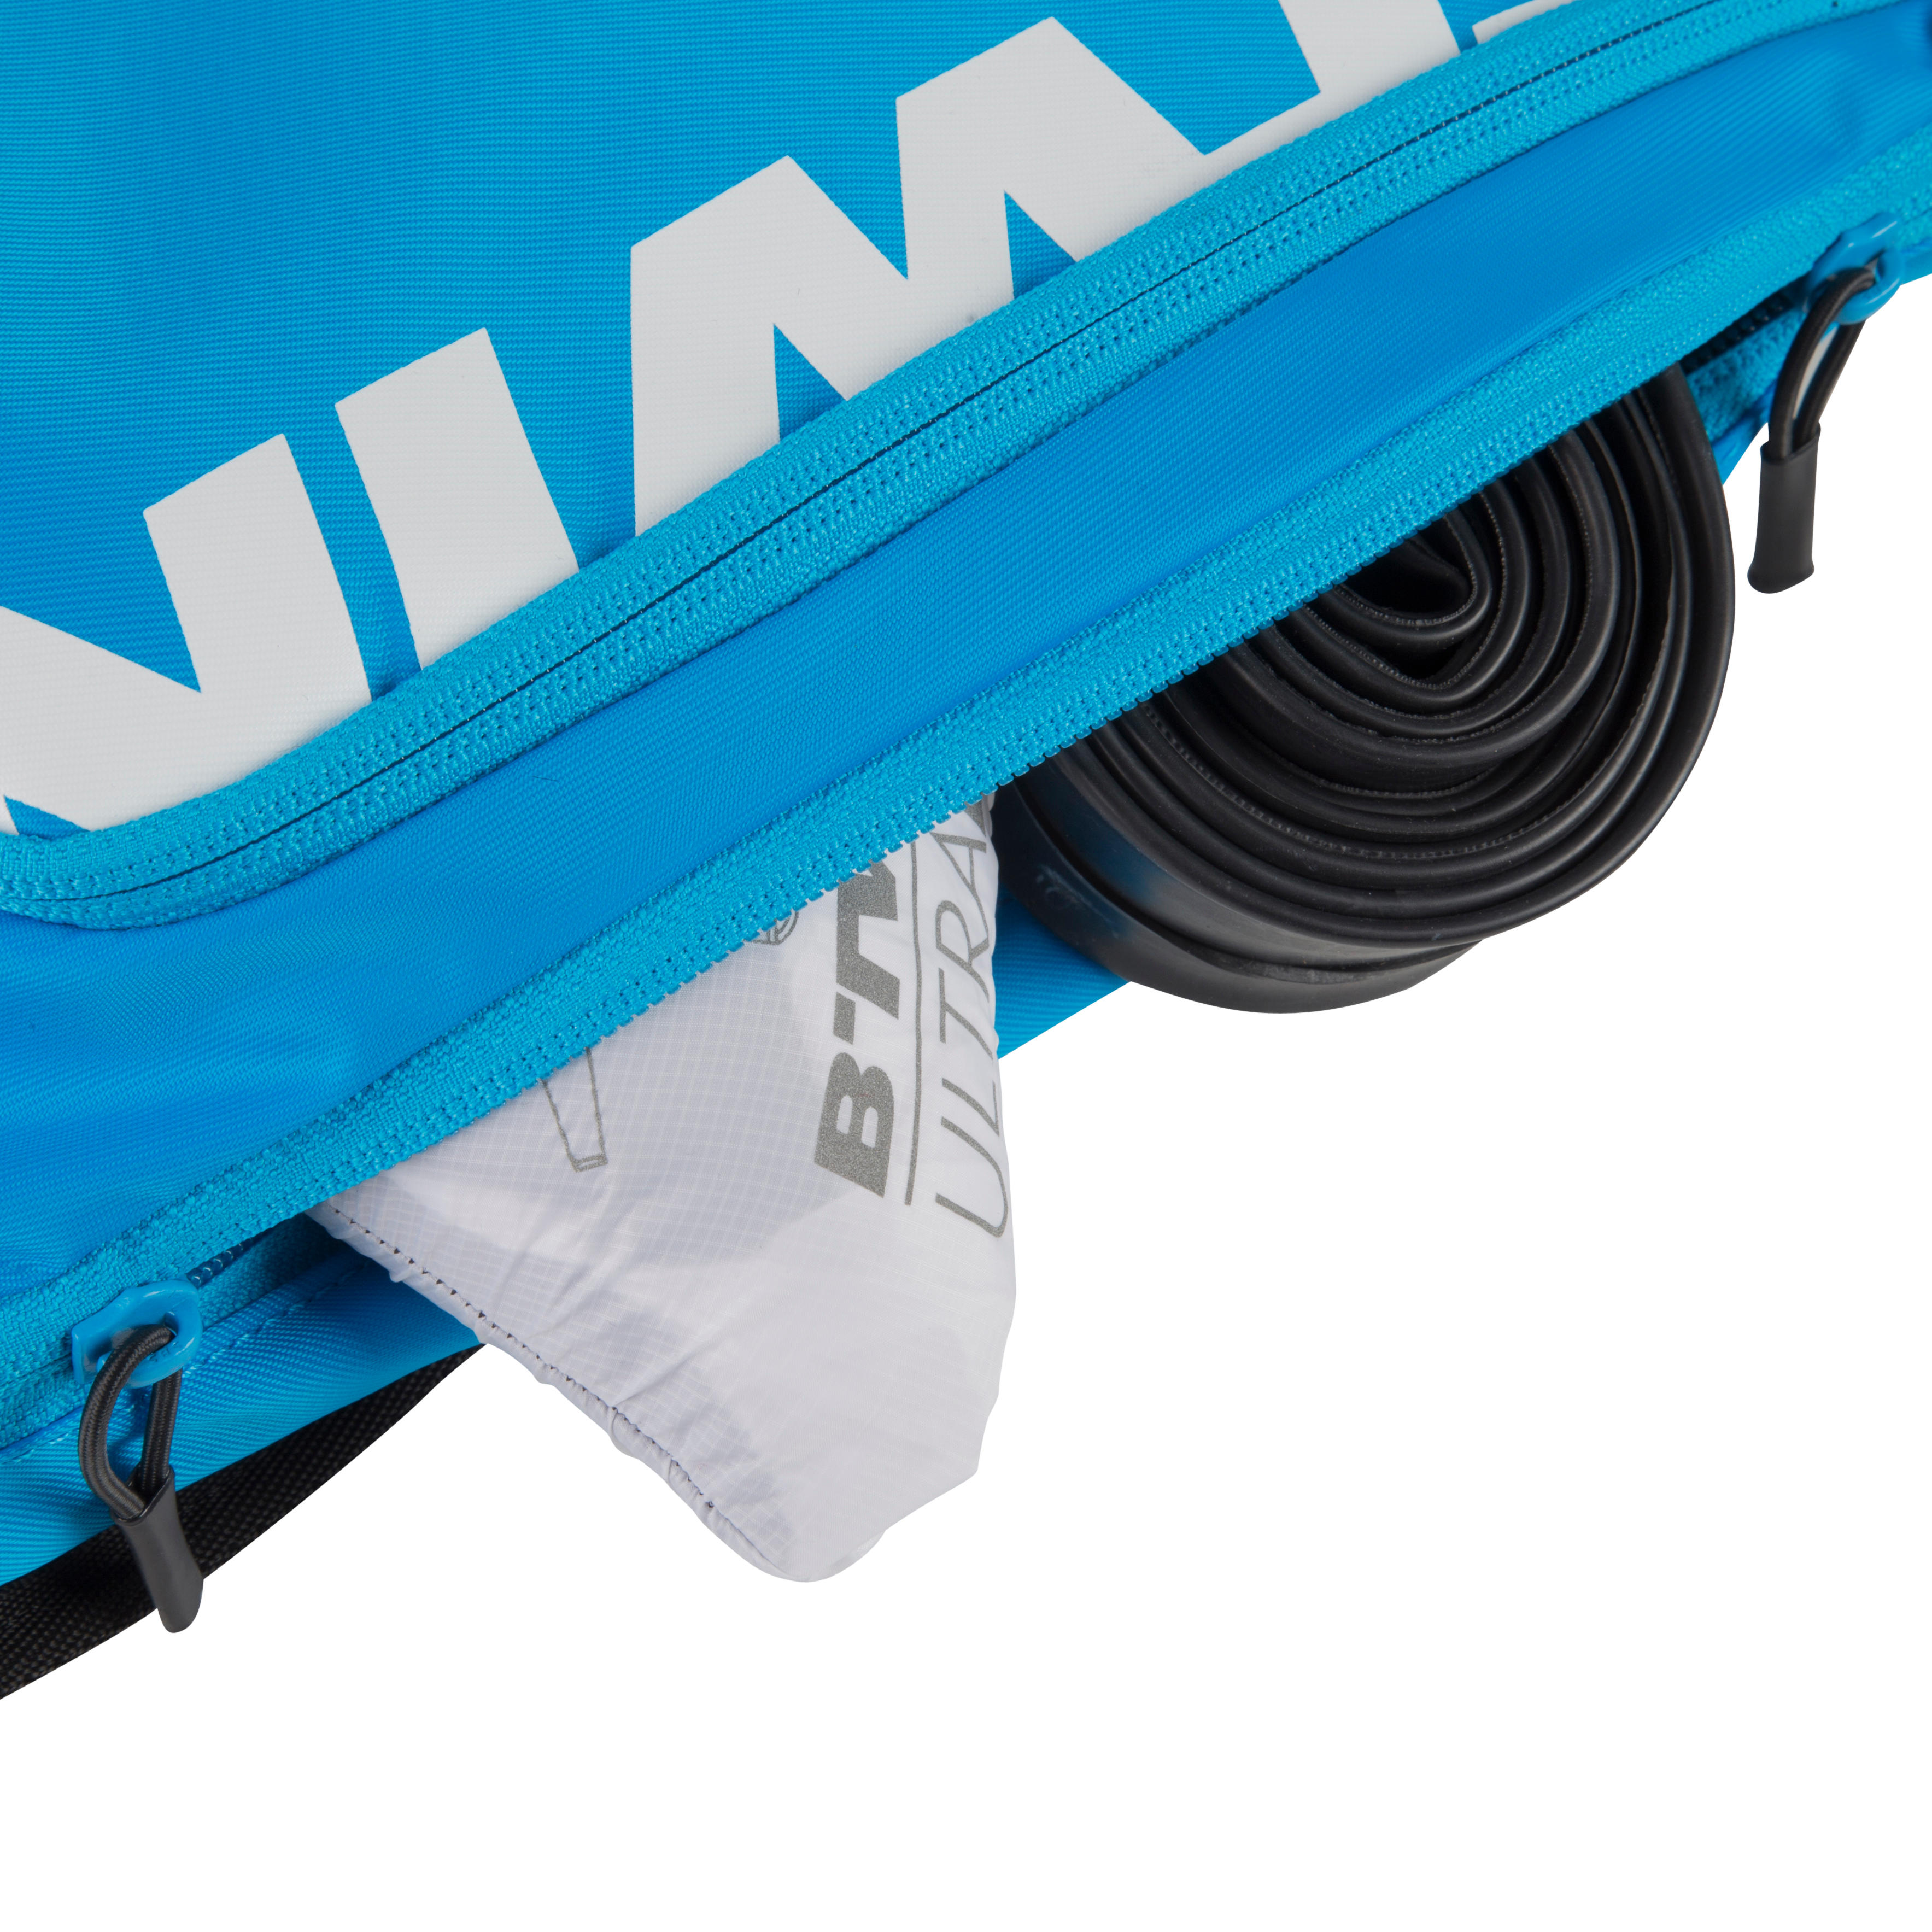 520 MTB Hydration Pack - Blue